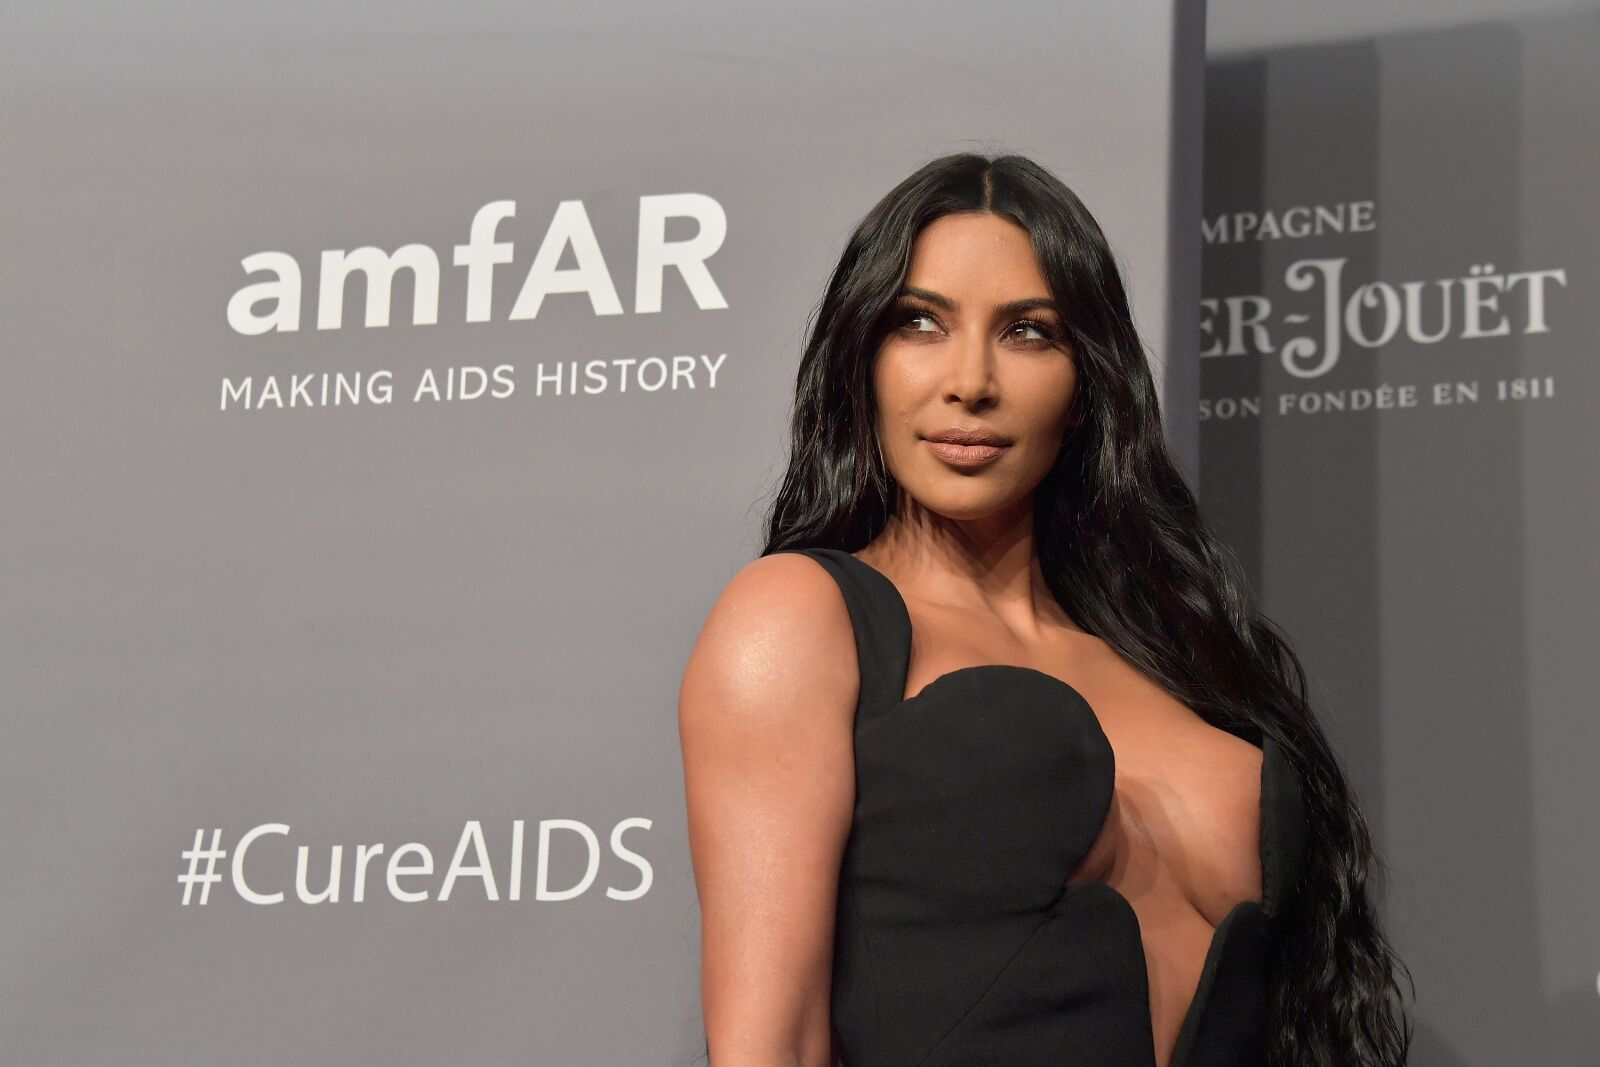 Kim Kardashian shows off curvy figure and long locks in new post